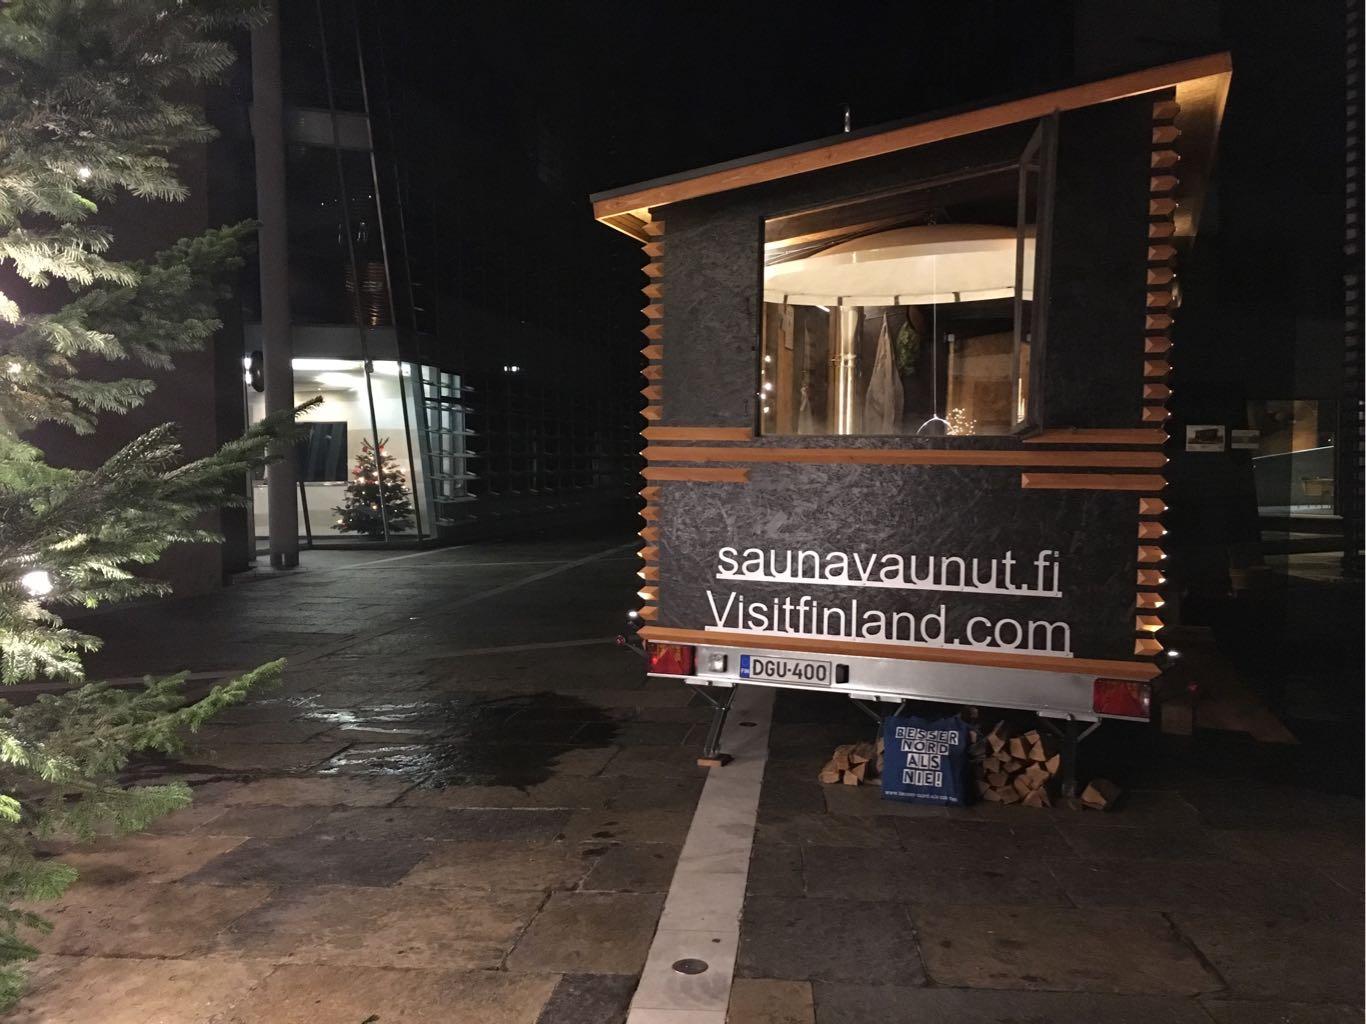 Fahrbare Sauna